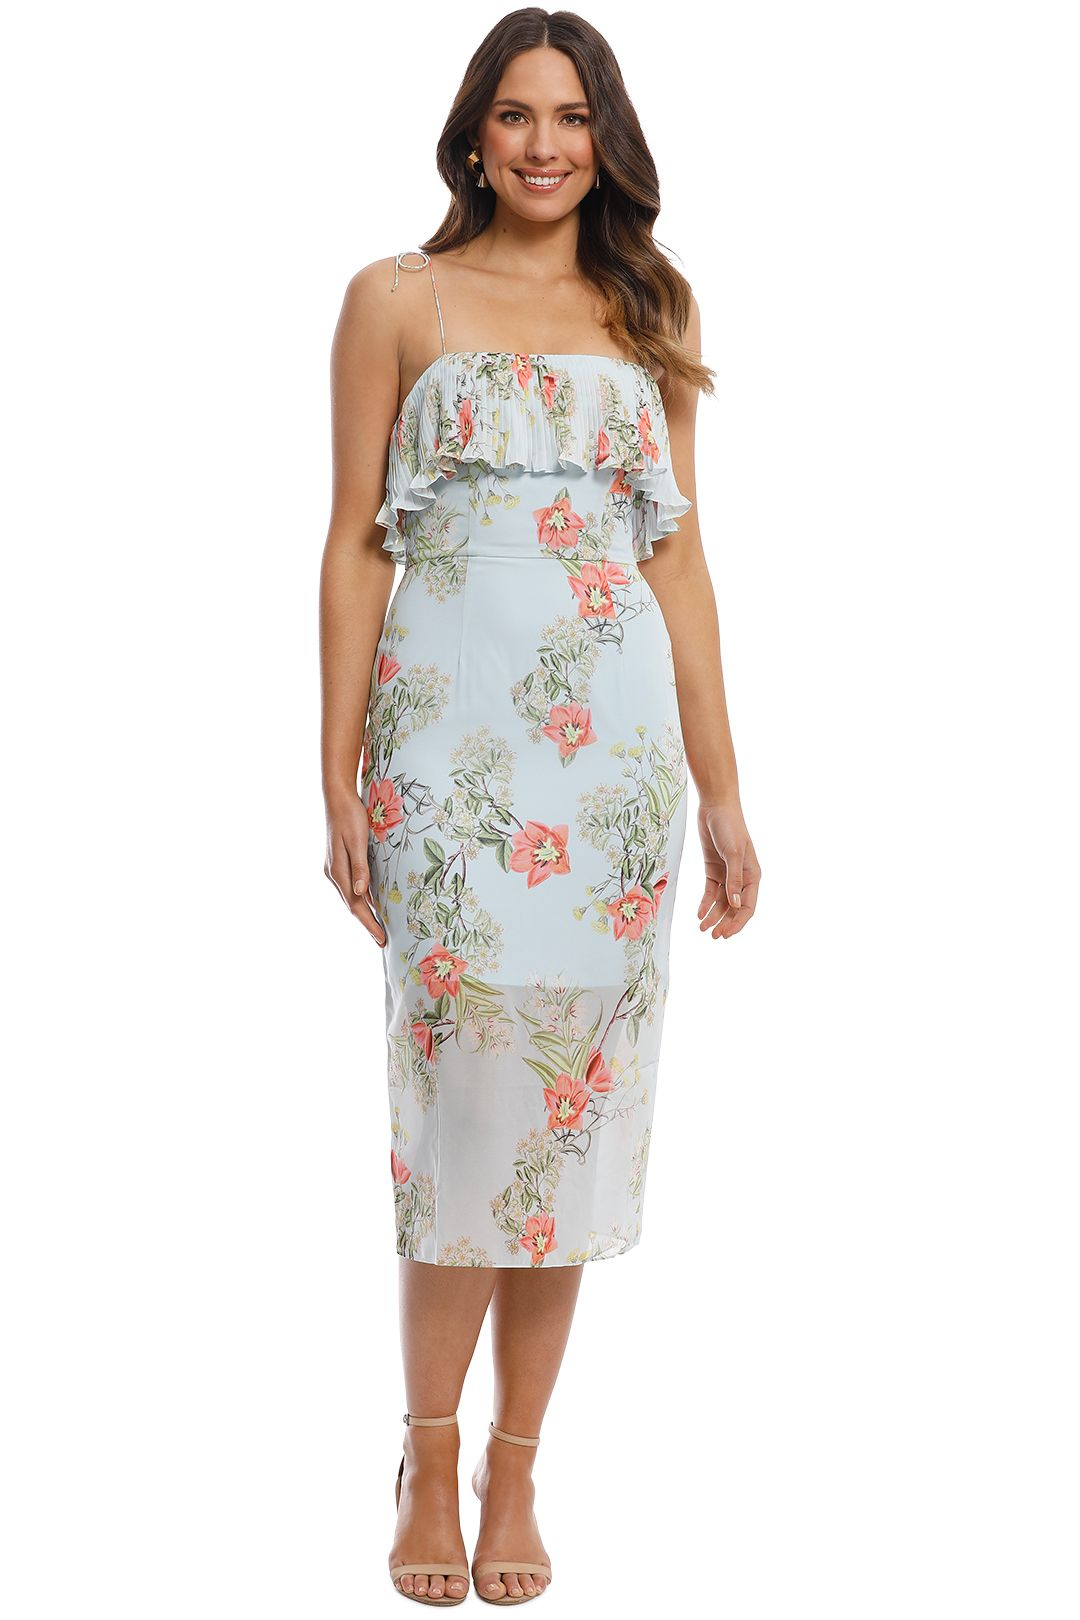 Cooper St - Blooming Knee Length Dress - Print Light - Front